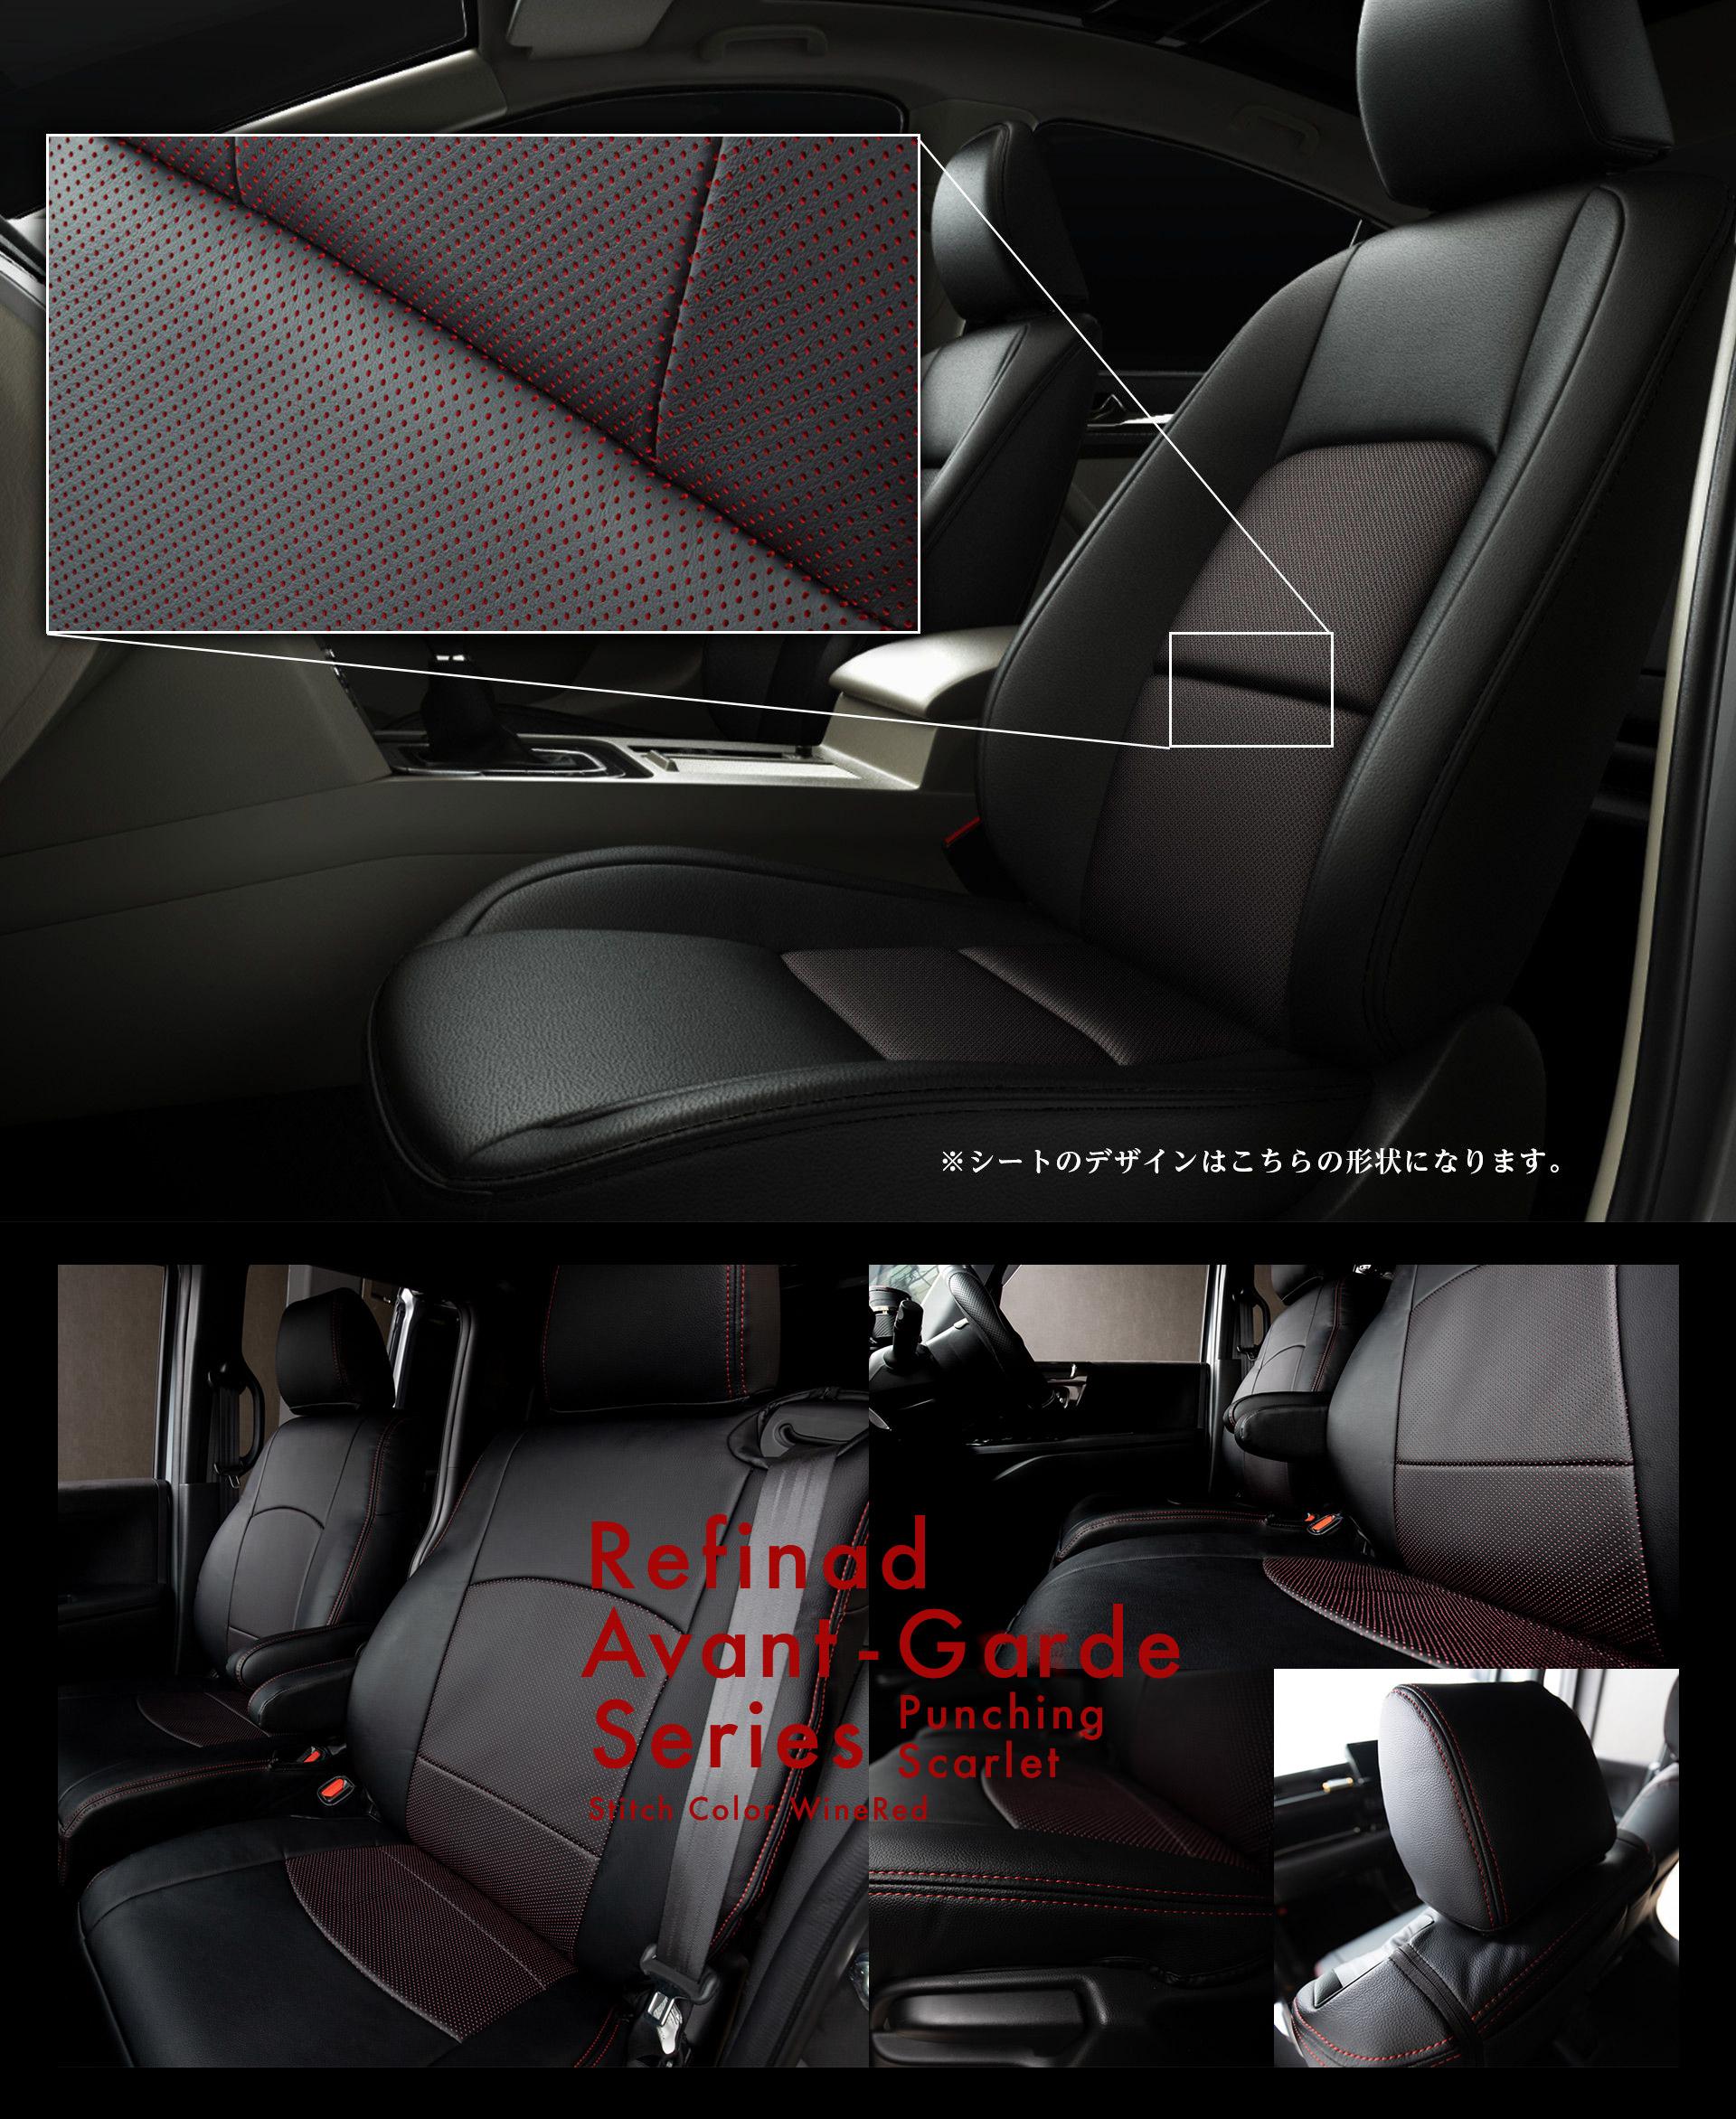 Refinad Avant-Garde Series シートのデザインはこちらの形状になります。